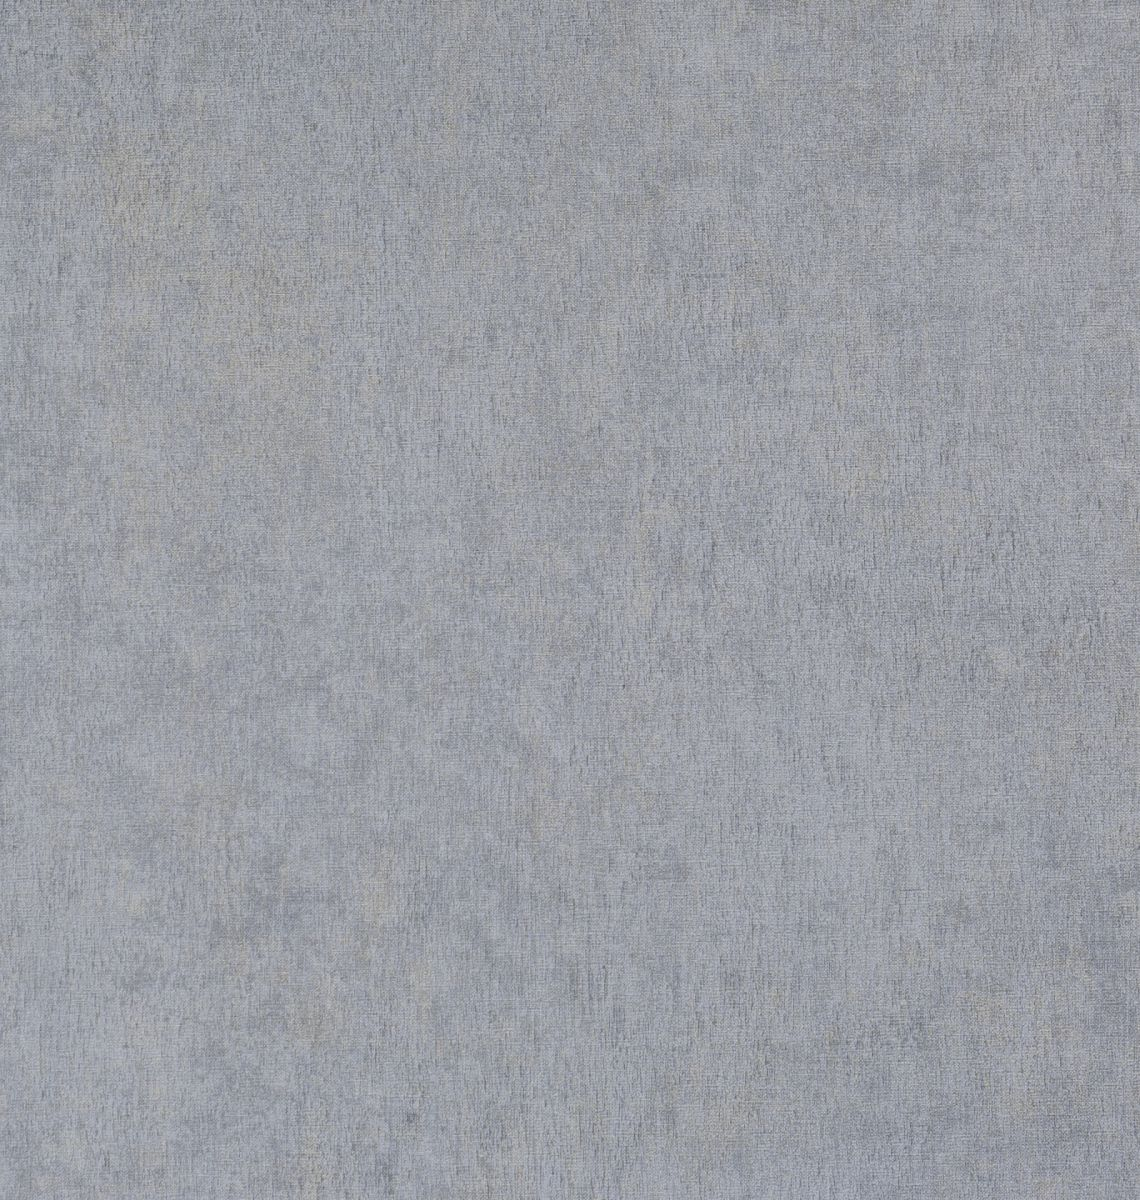 Hochwertige tapeten und stoffe vliestapete grau blau 50 - Vliestapete grau ...